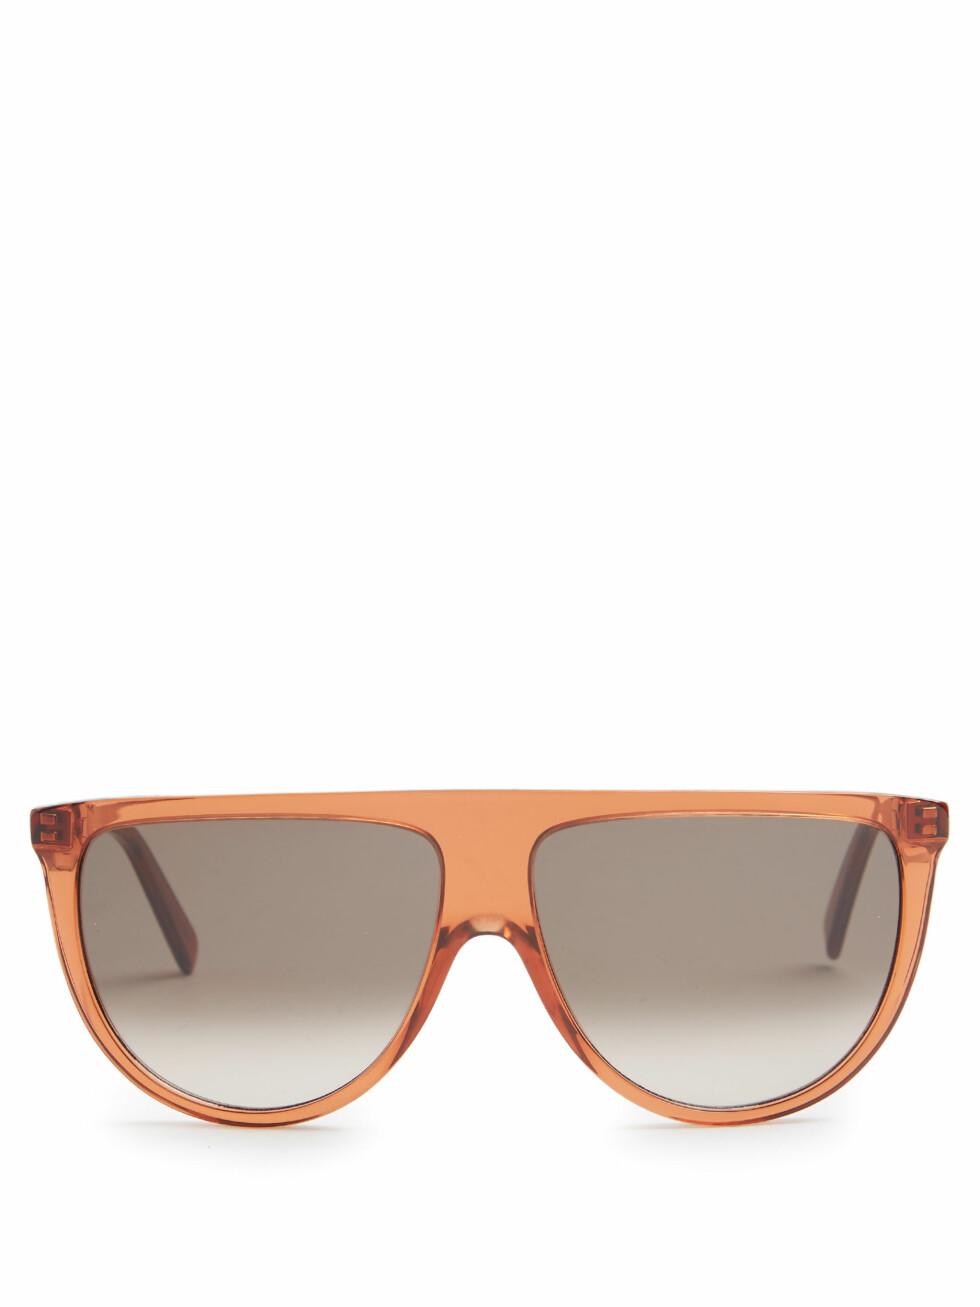 Solbriller fra Celine via Matchesfashion.com   kr 1905   http://www.matchesfashion.com/intl/products/C%C3%A9line-Eyewear-Shadow-flat-top-sunglasses-1077835